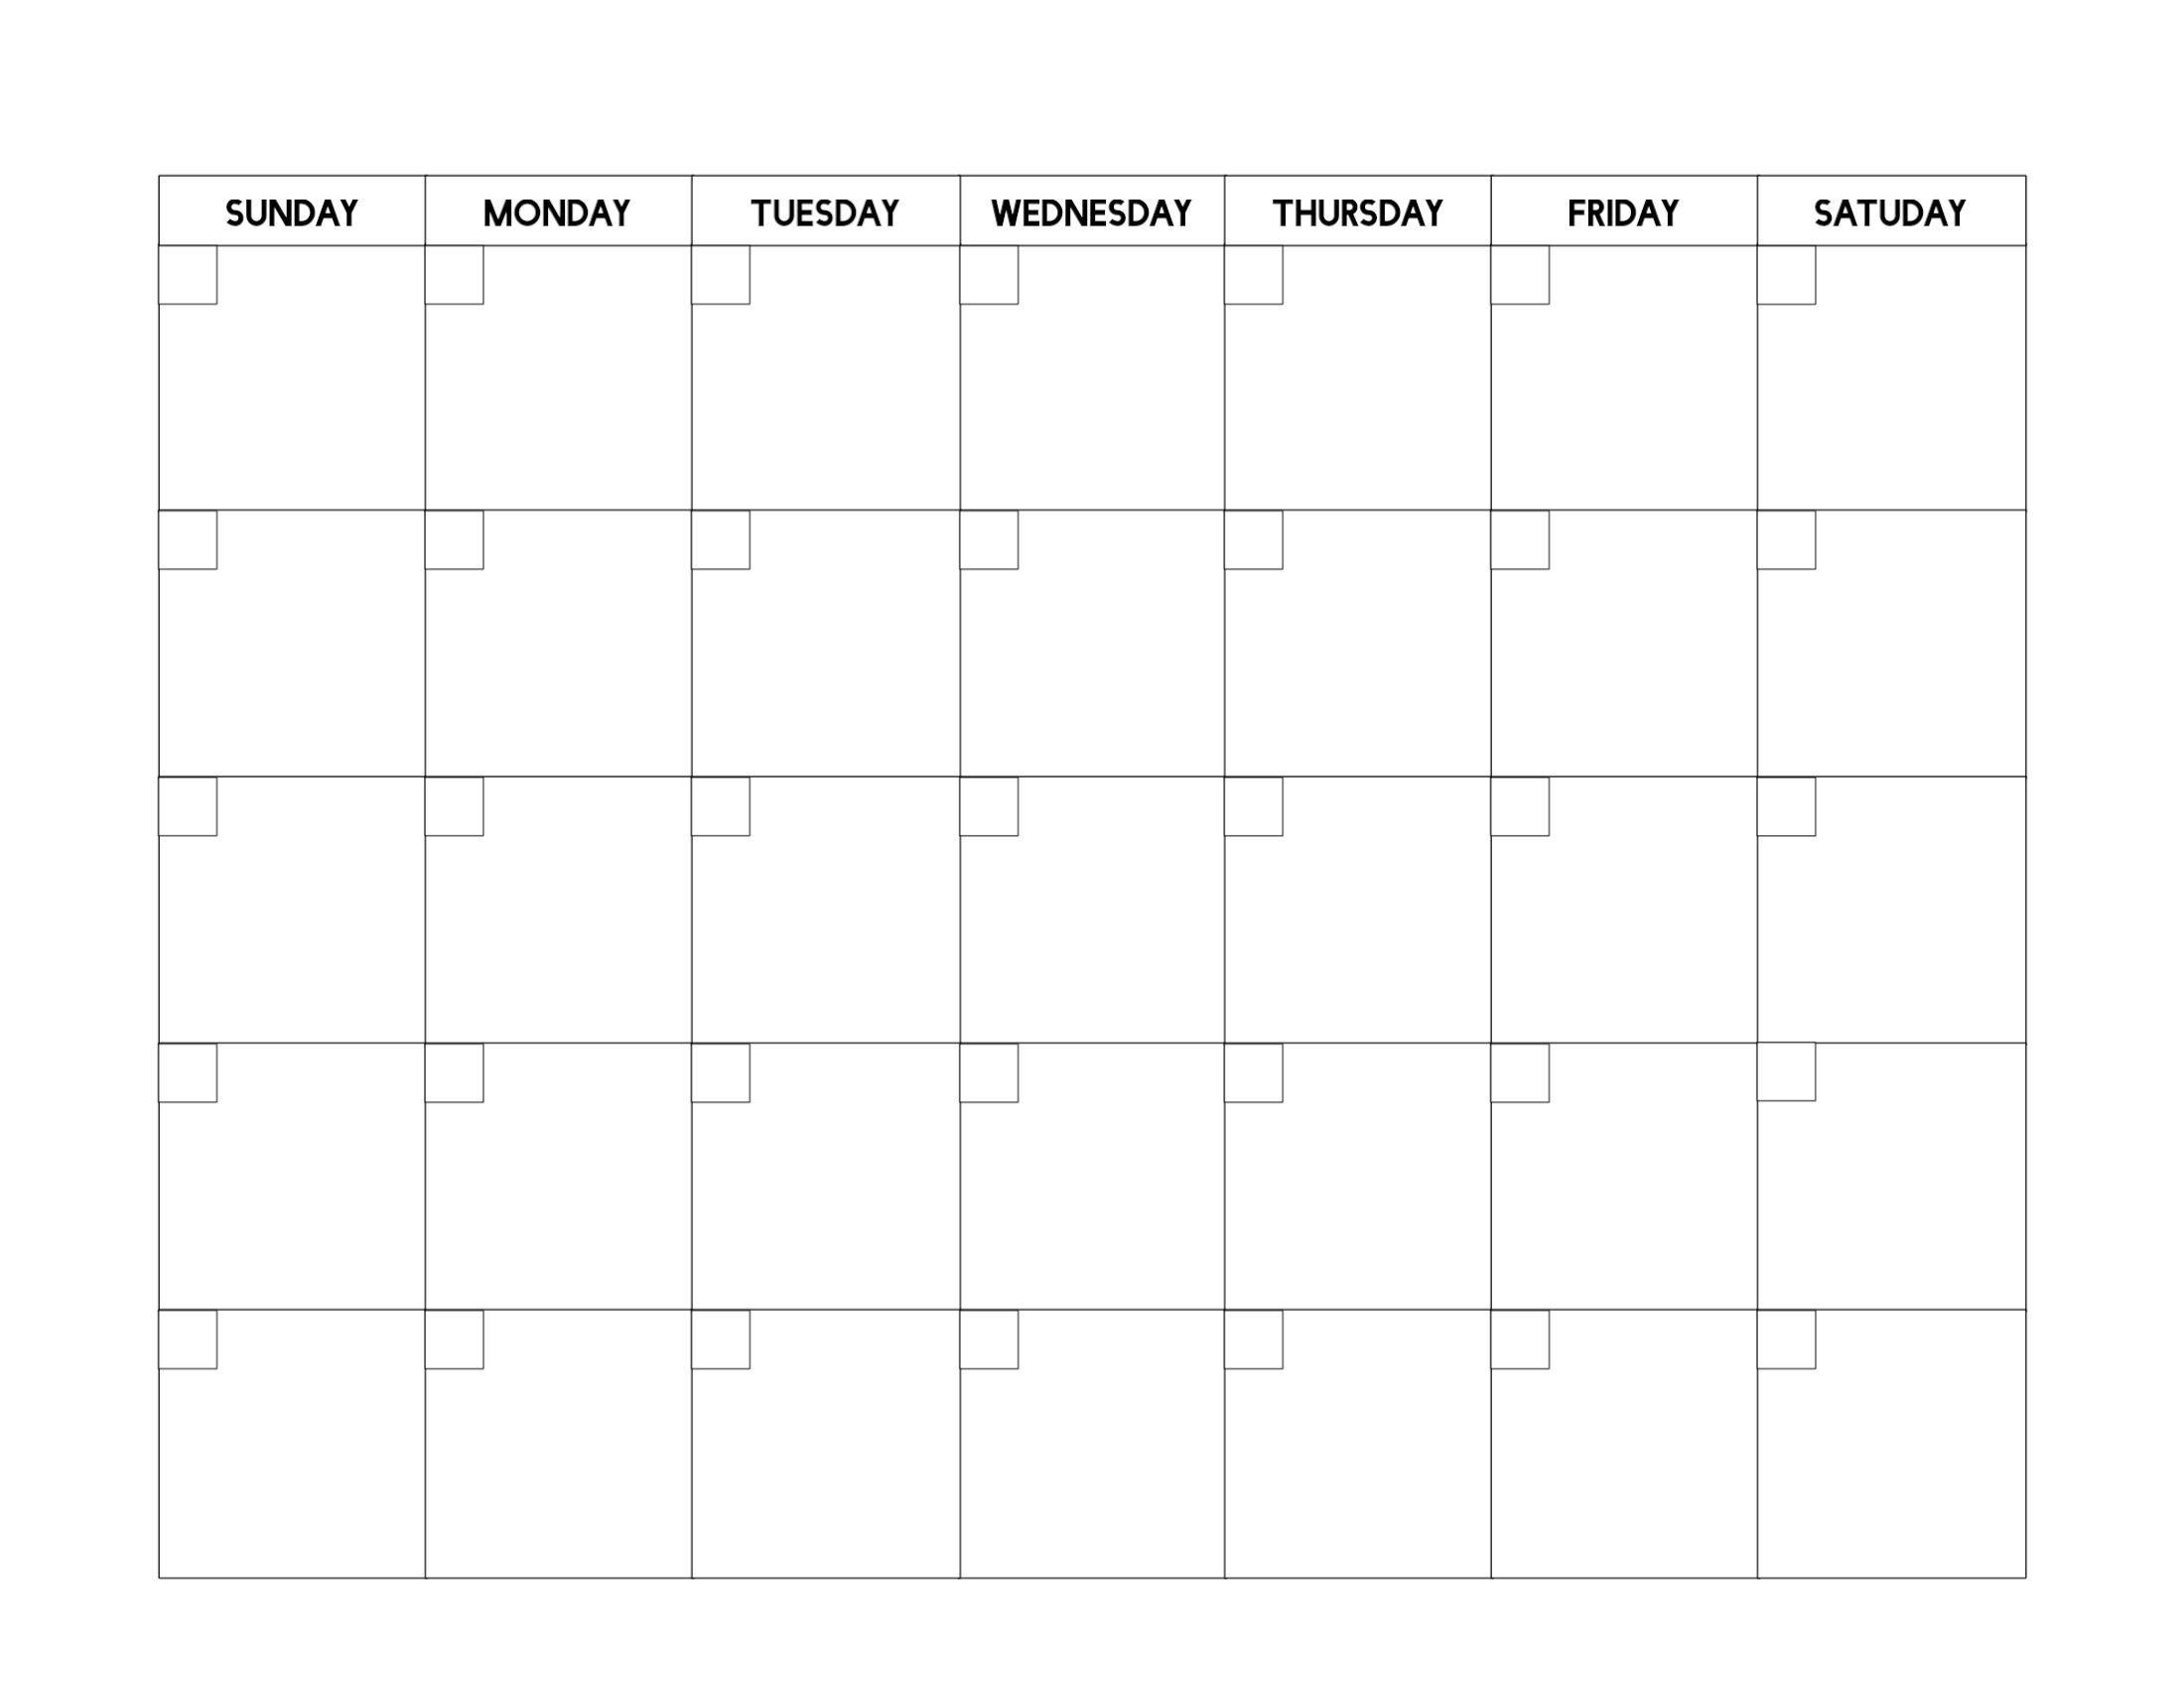 Universal Blank Calendar To Fill In 2020 | Blank Calendar